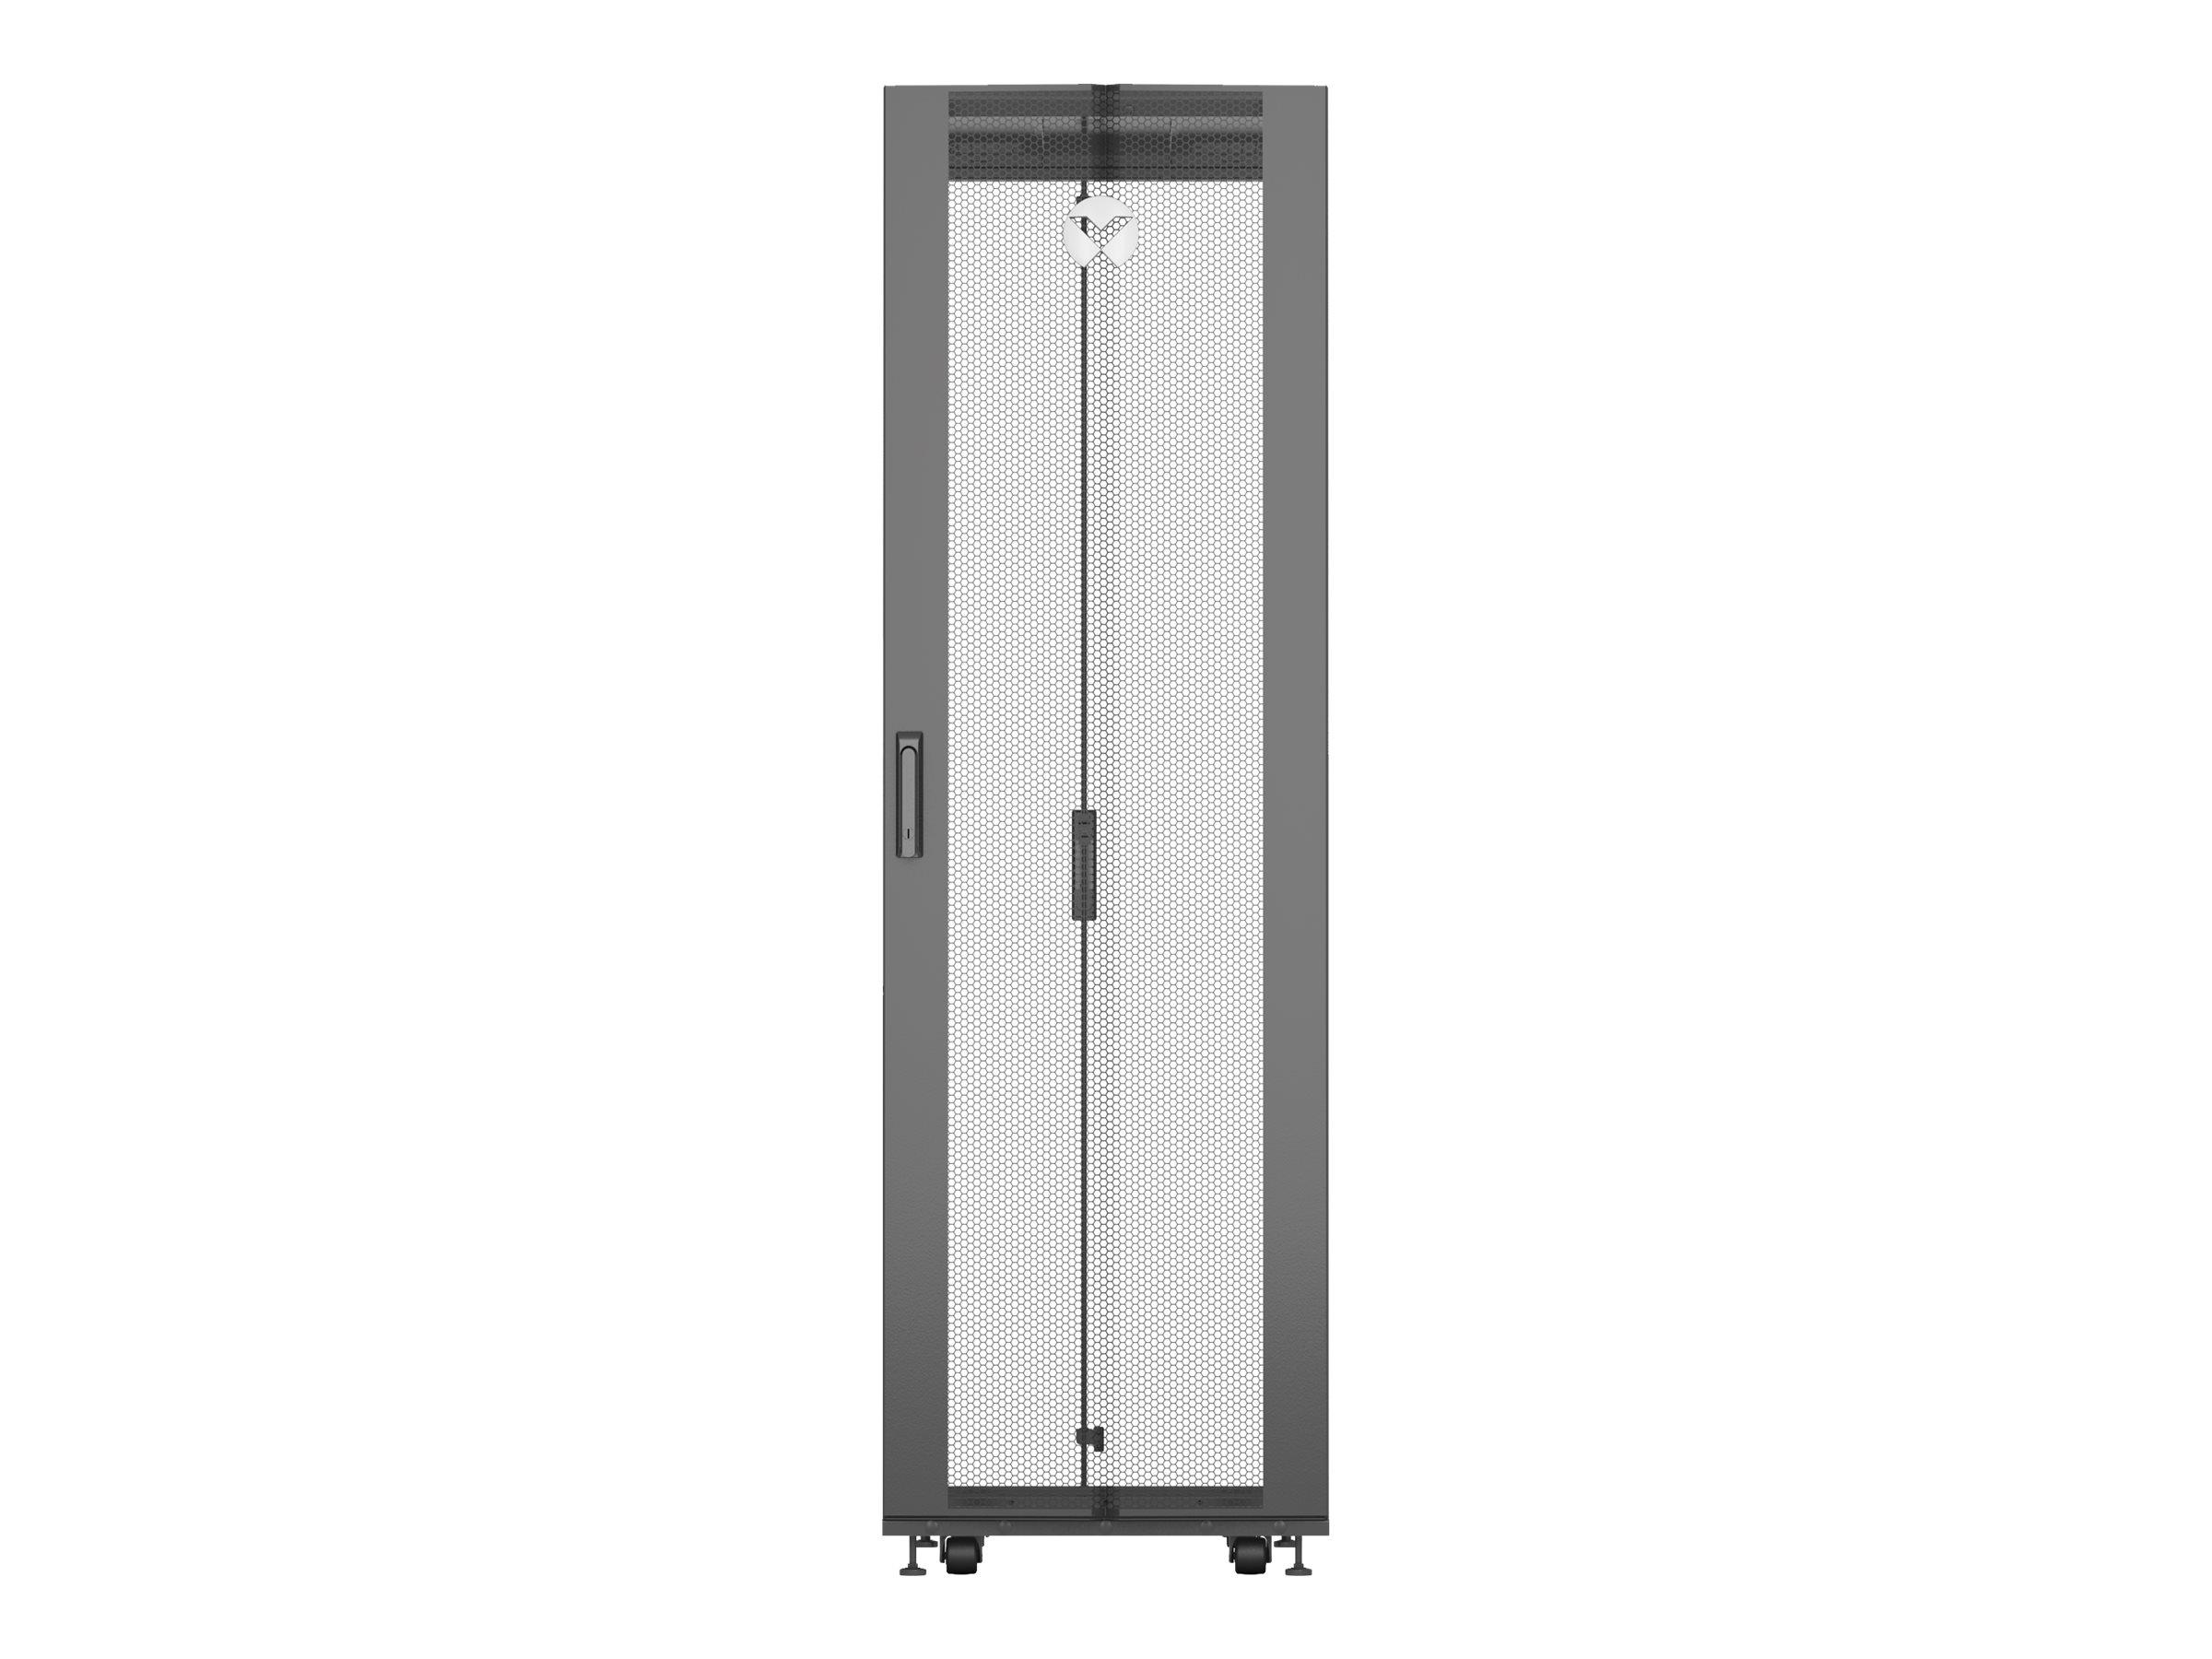 Vertiv VR Komplett - Schrank - Schwarz, RAL 7021 - 42HE - 48.3 cm (19